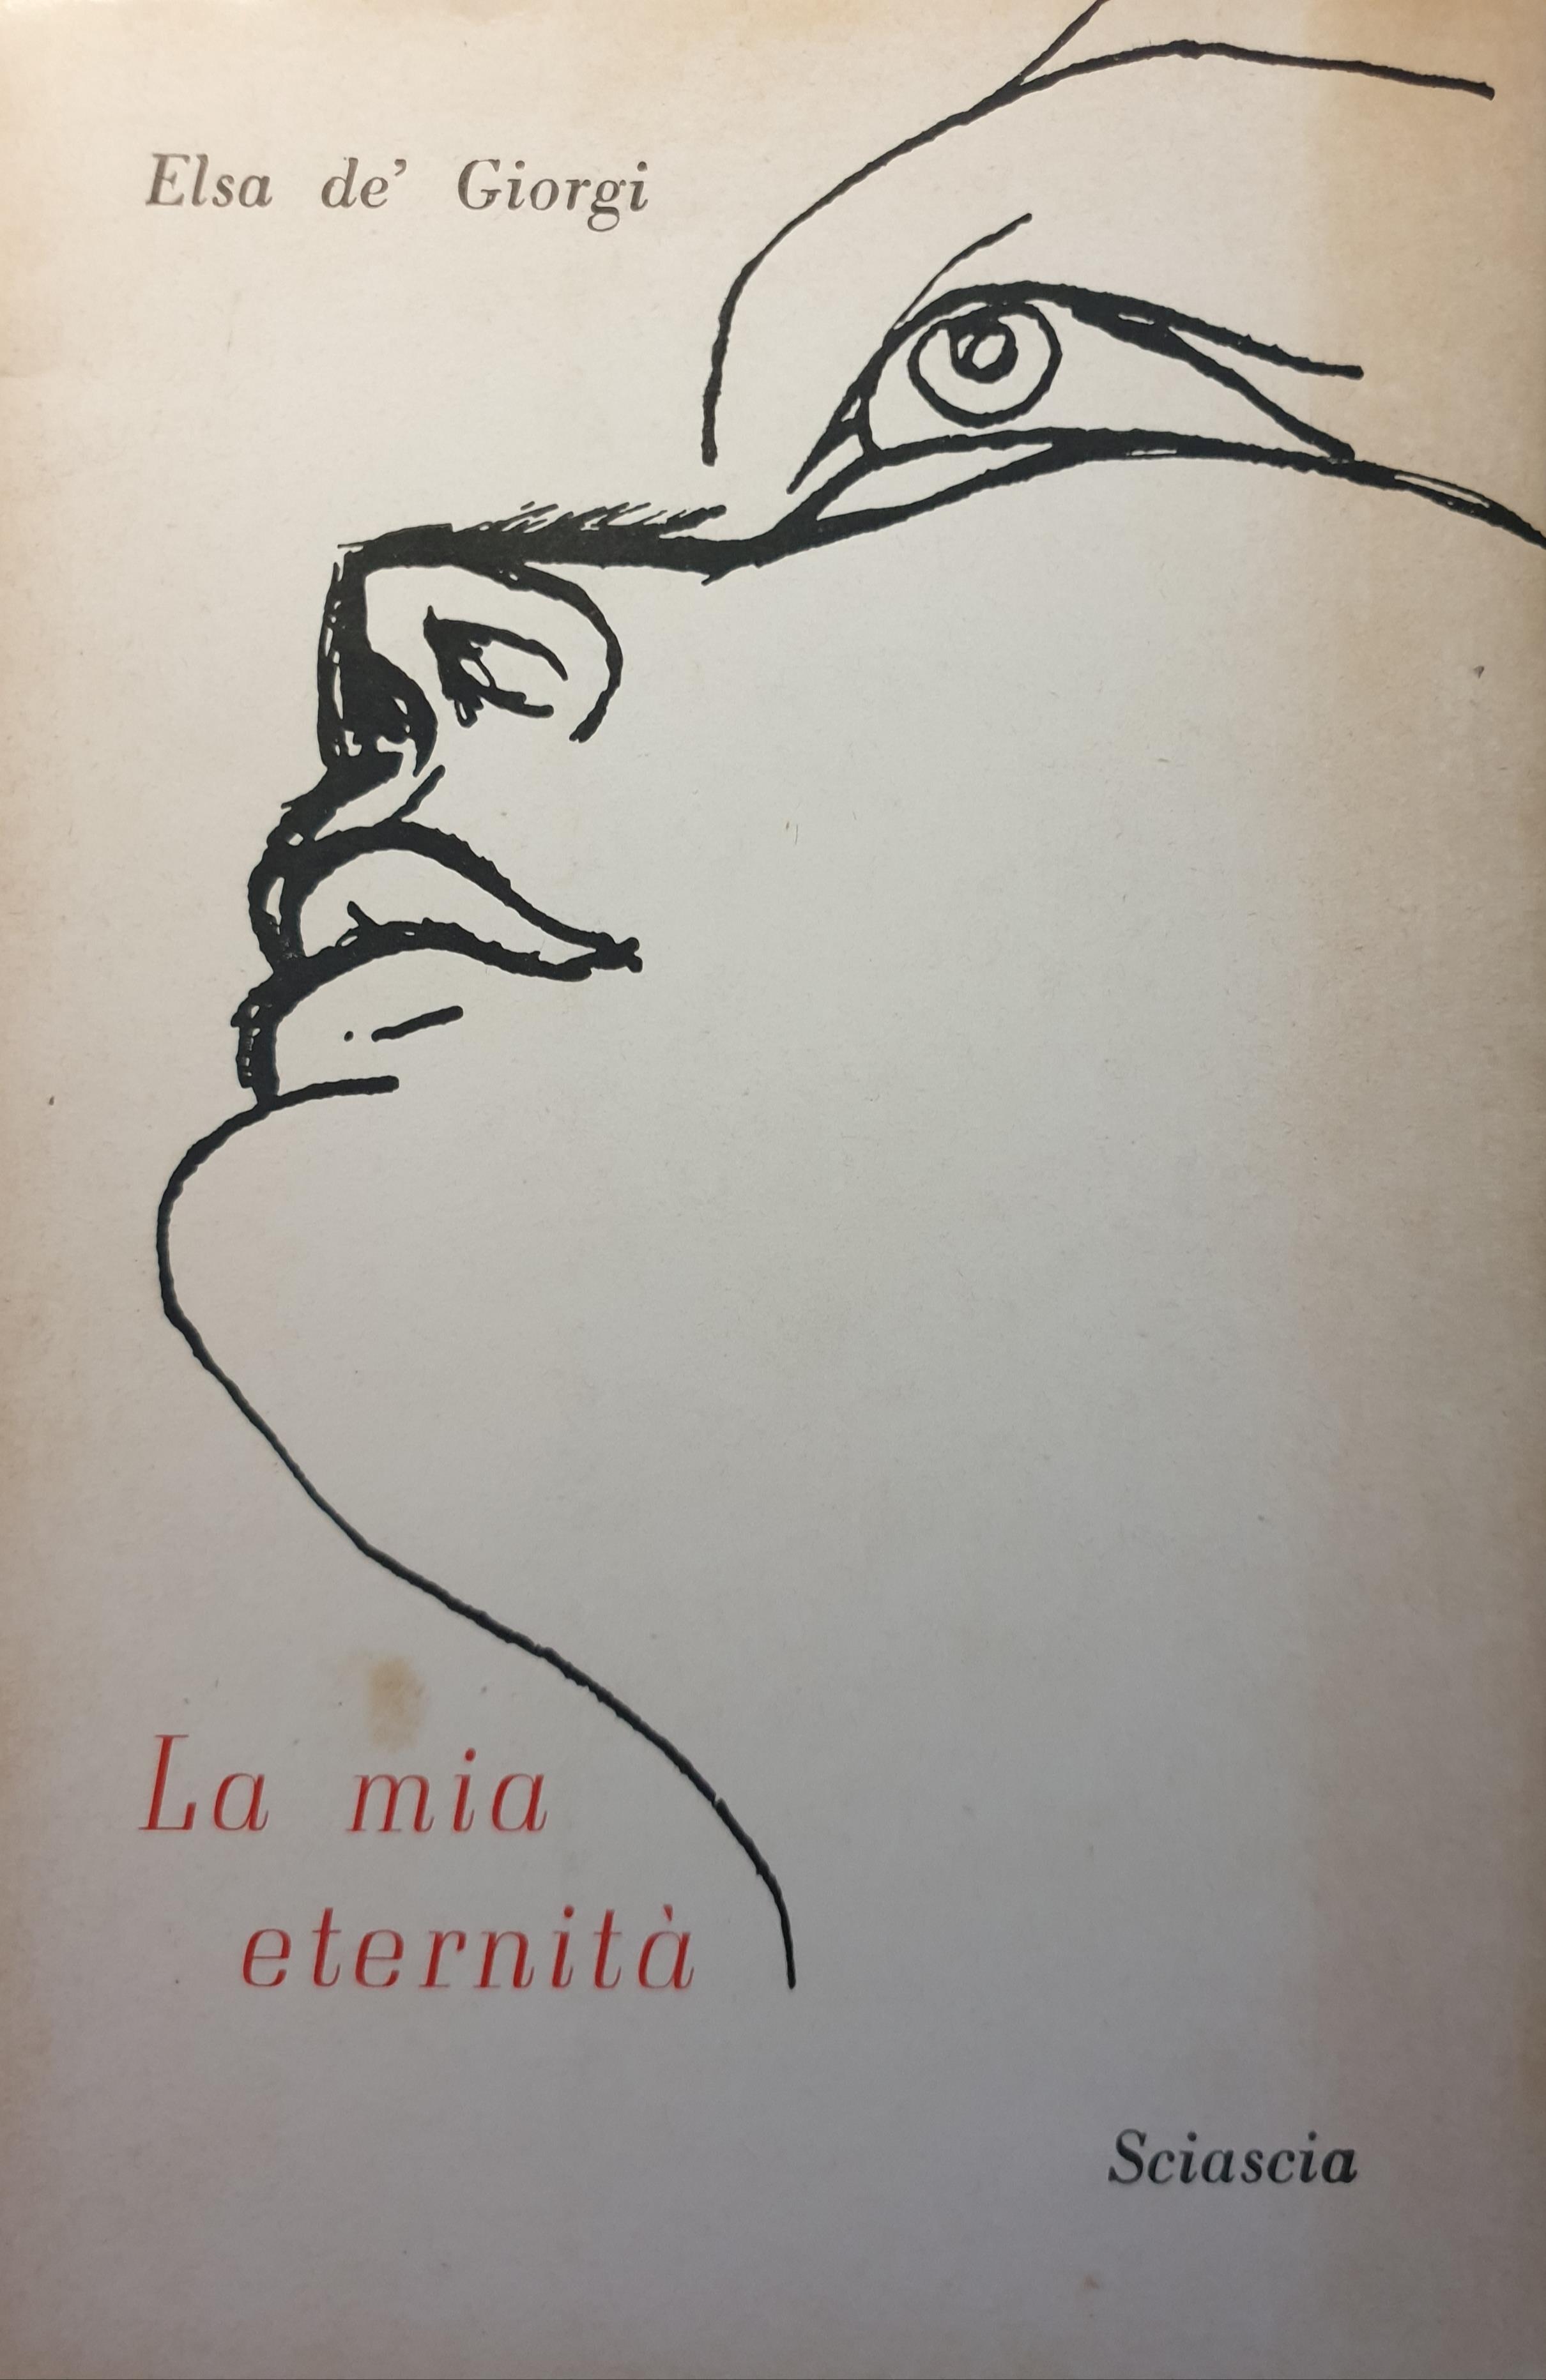 Fig. 4 Elsa de' Giorgi, La mia eternità (1962)